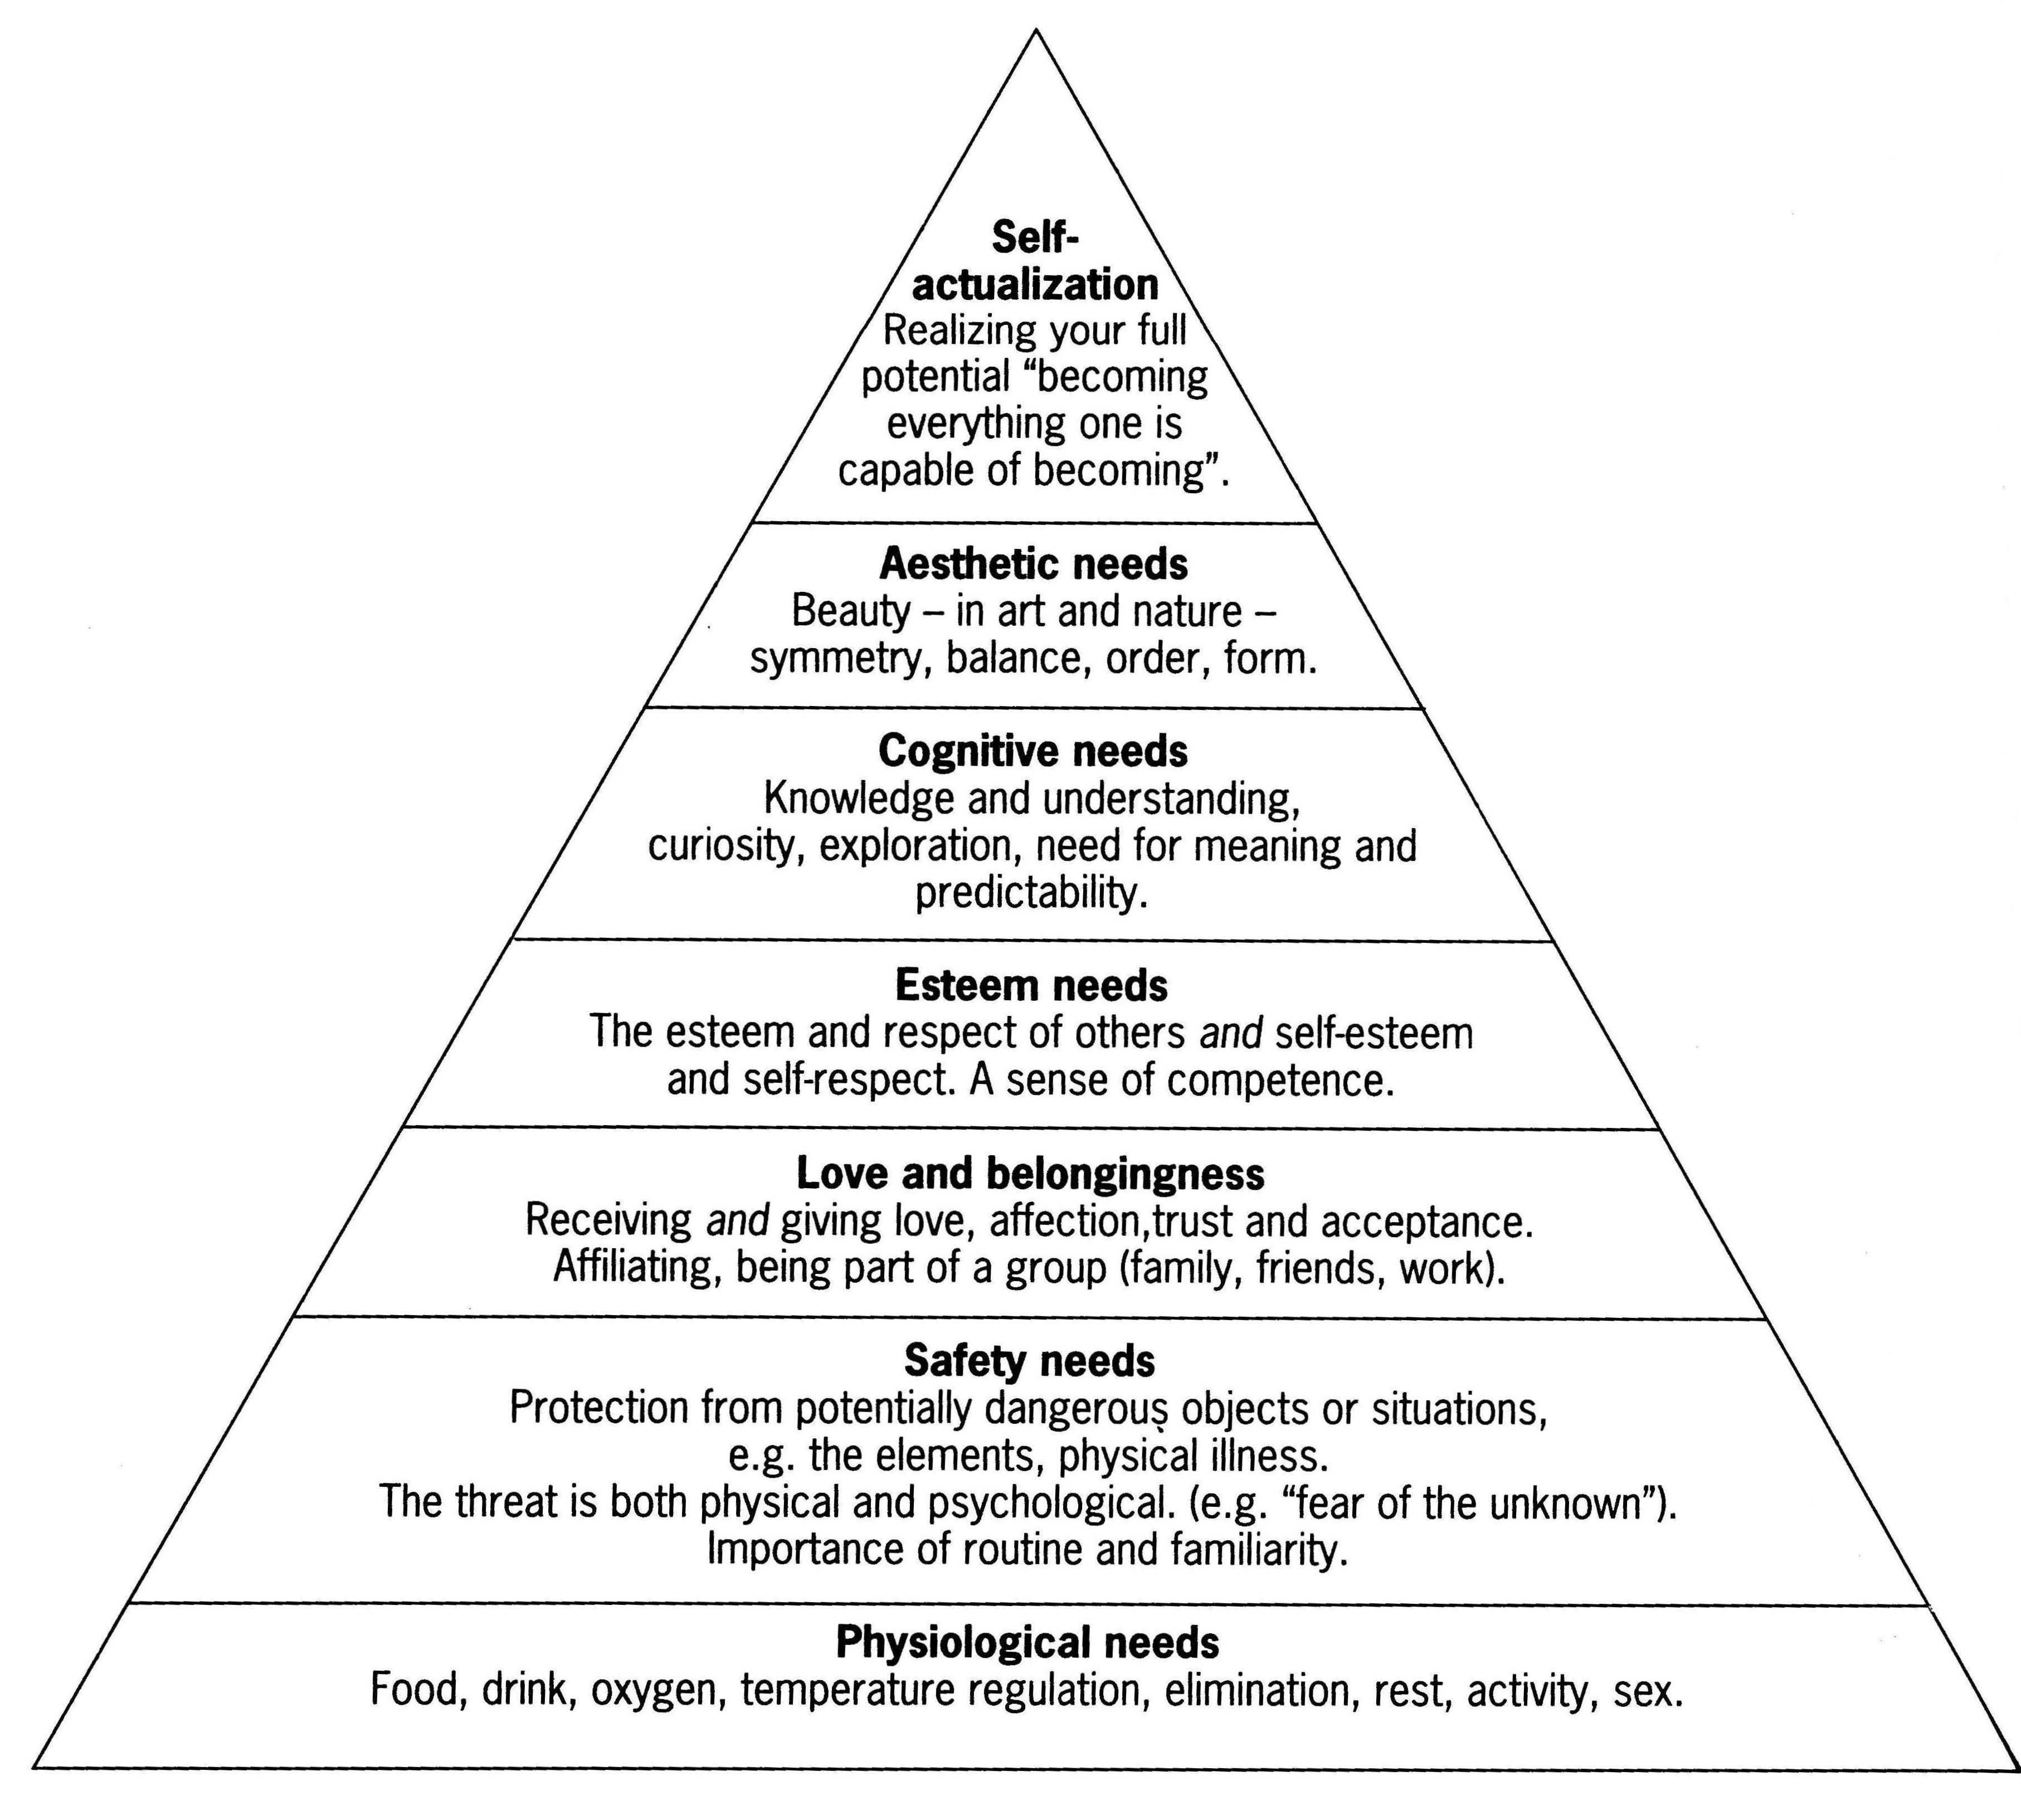 S Media Cache Ak0 Pinimg Com Originals 4d Ee 65 4dee65aad9ca45ffbfdffc52212fd39c Maslow S Hierarchy Of Needs Maslow S Hierarchy Of Needs Humanistic Psychology